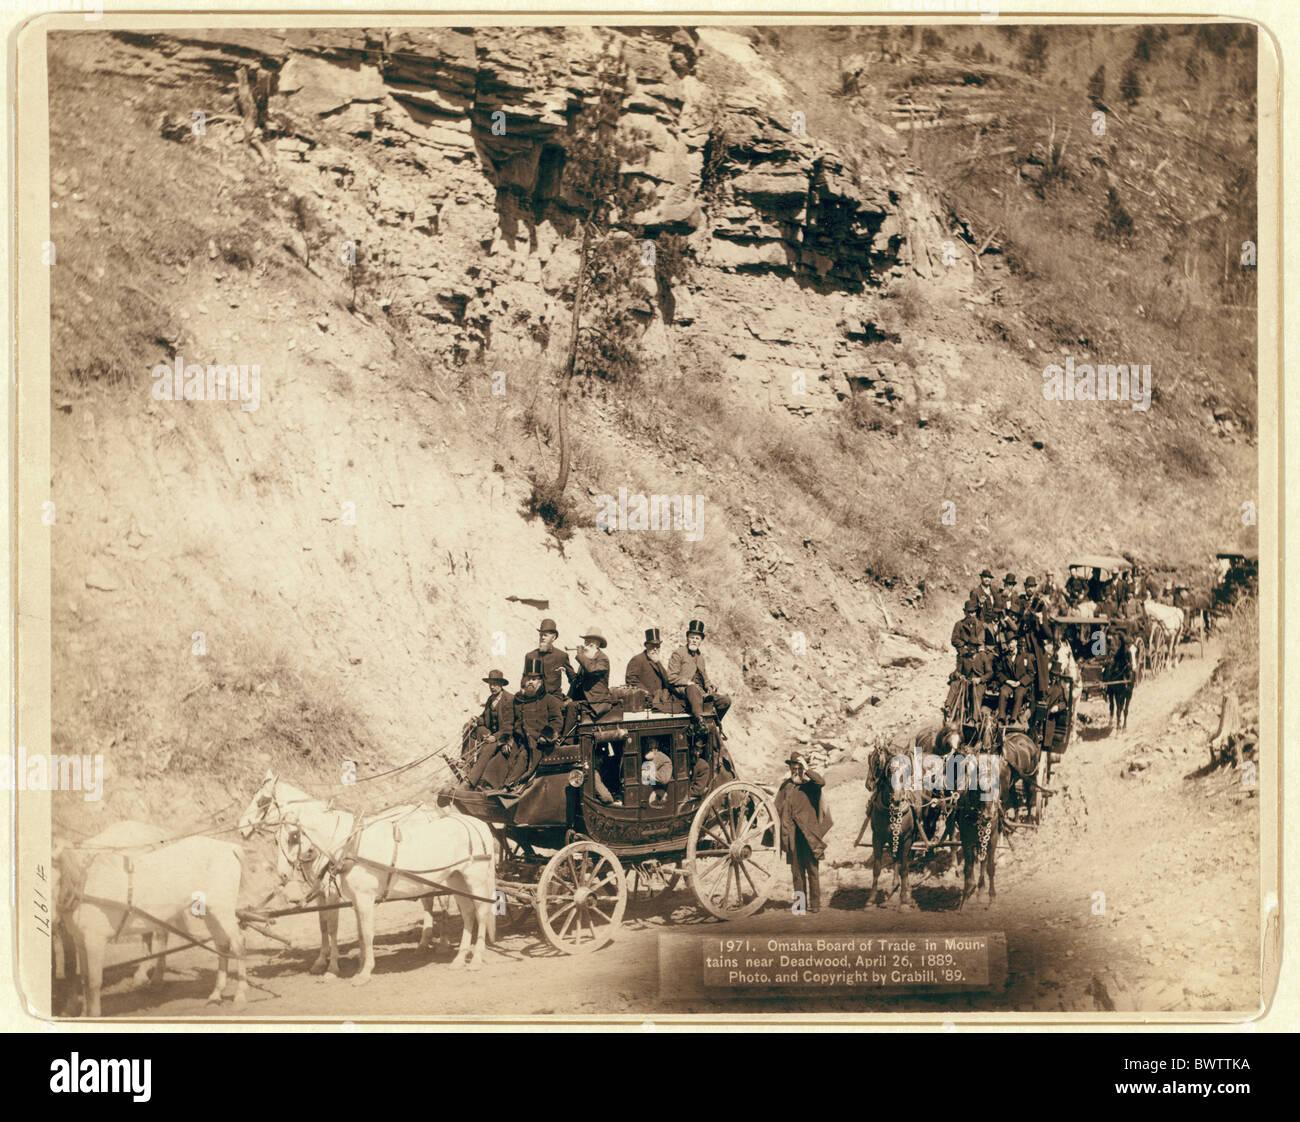 USA America United States North America Pine Ridge South Dakota stage coach transportation historical canyon - Stock Image